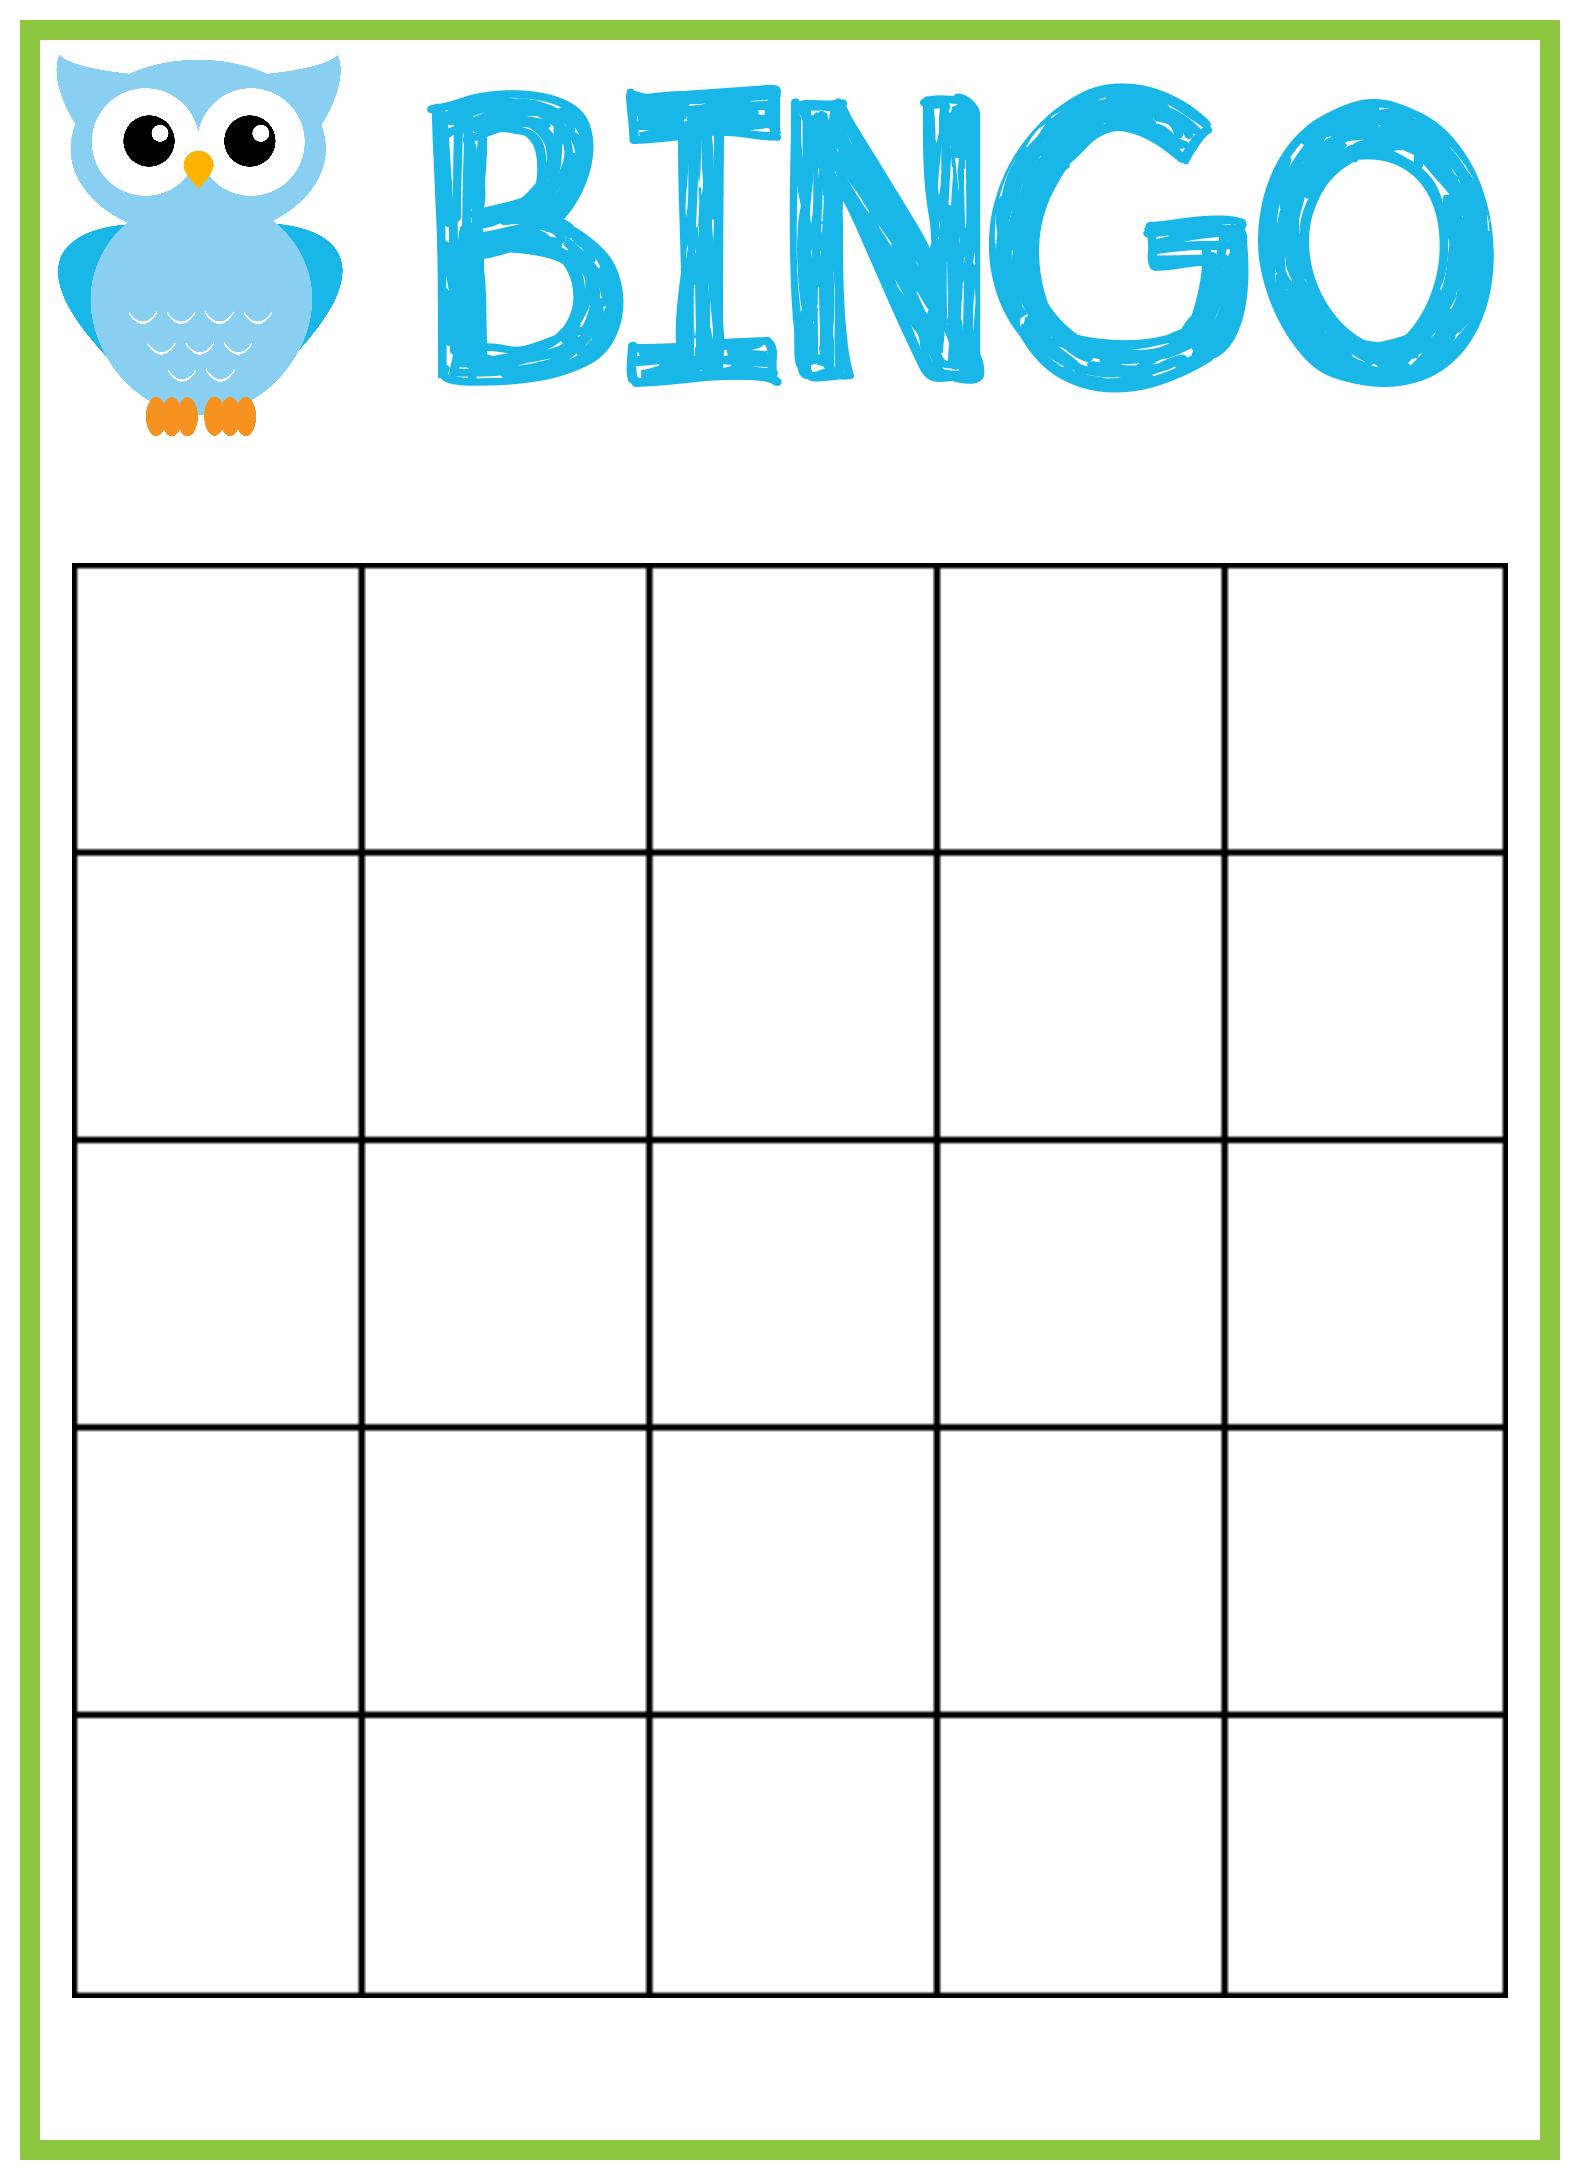 printable-baby-shower-bingo-card-template_24092.png (1580×2180) | Mi ...